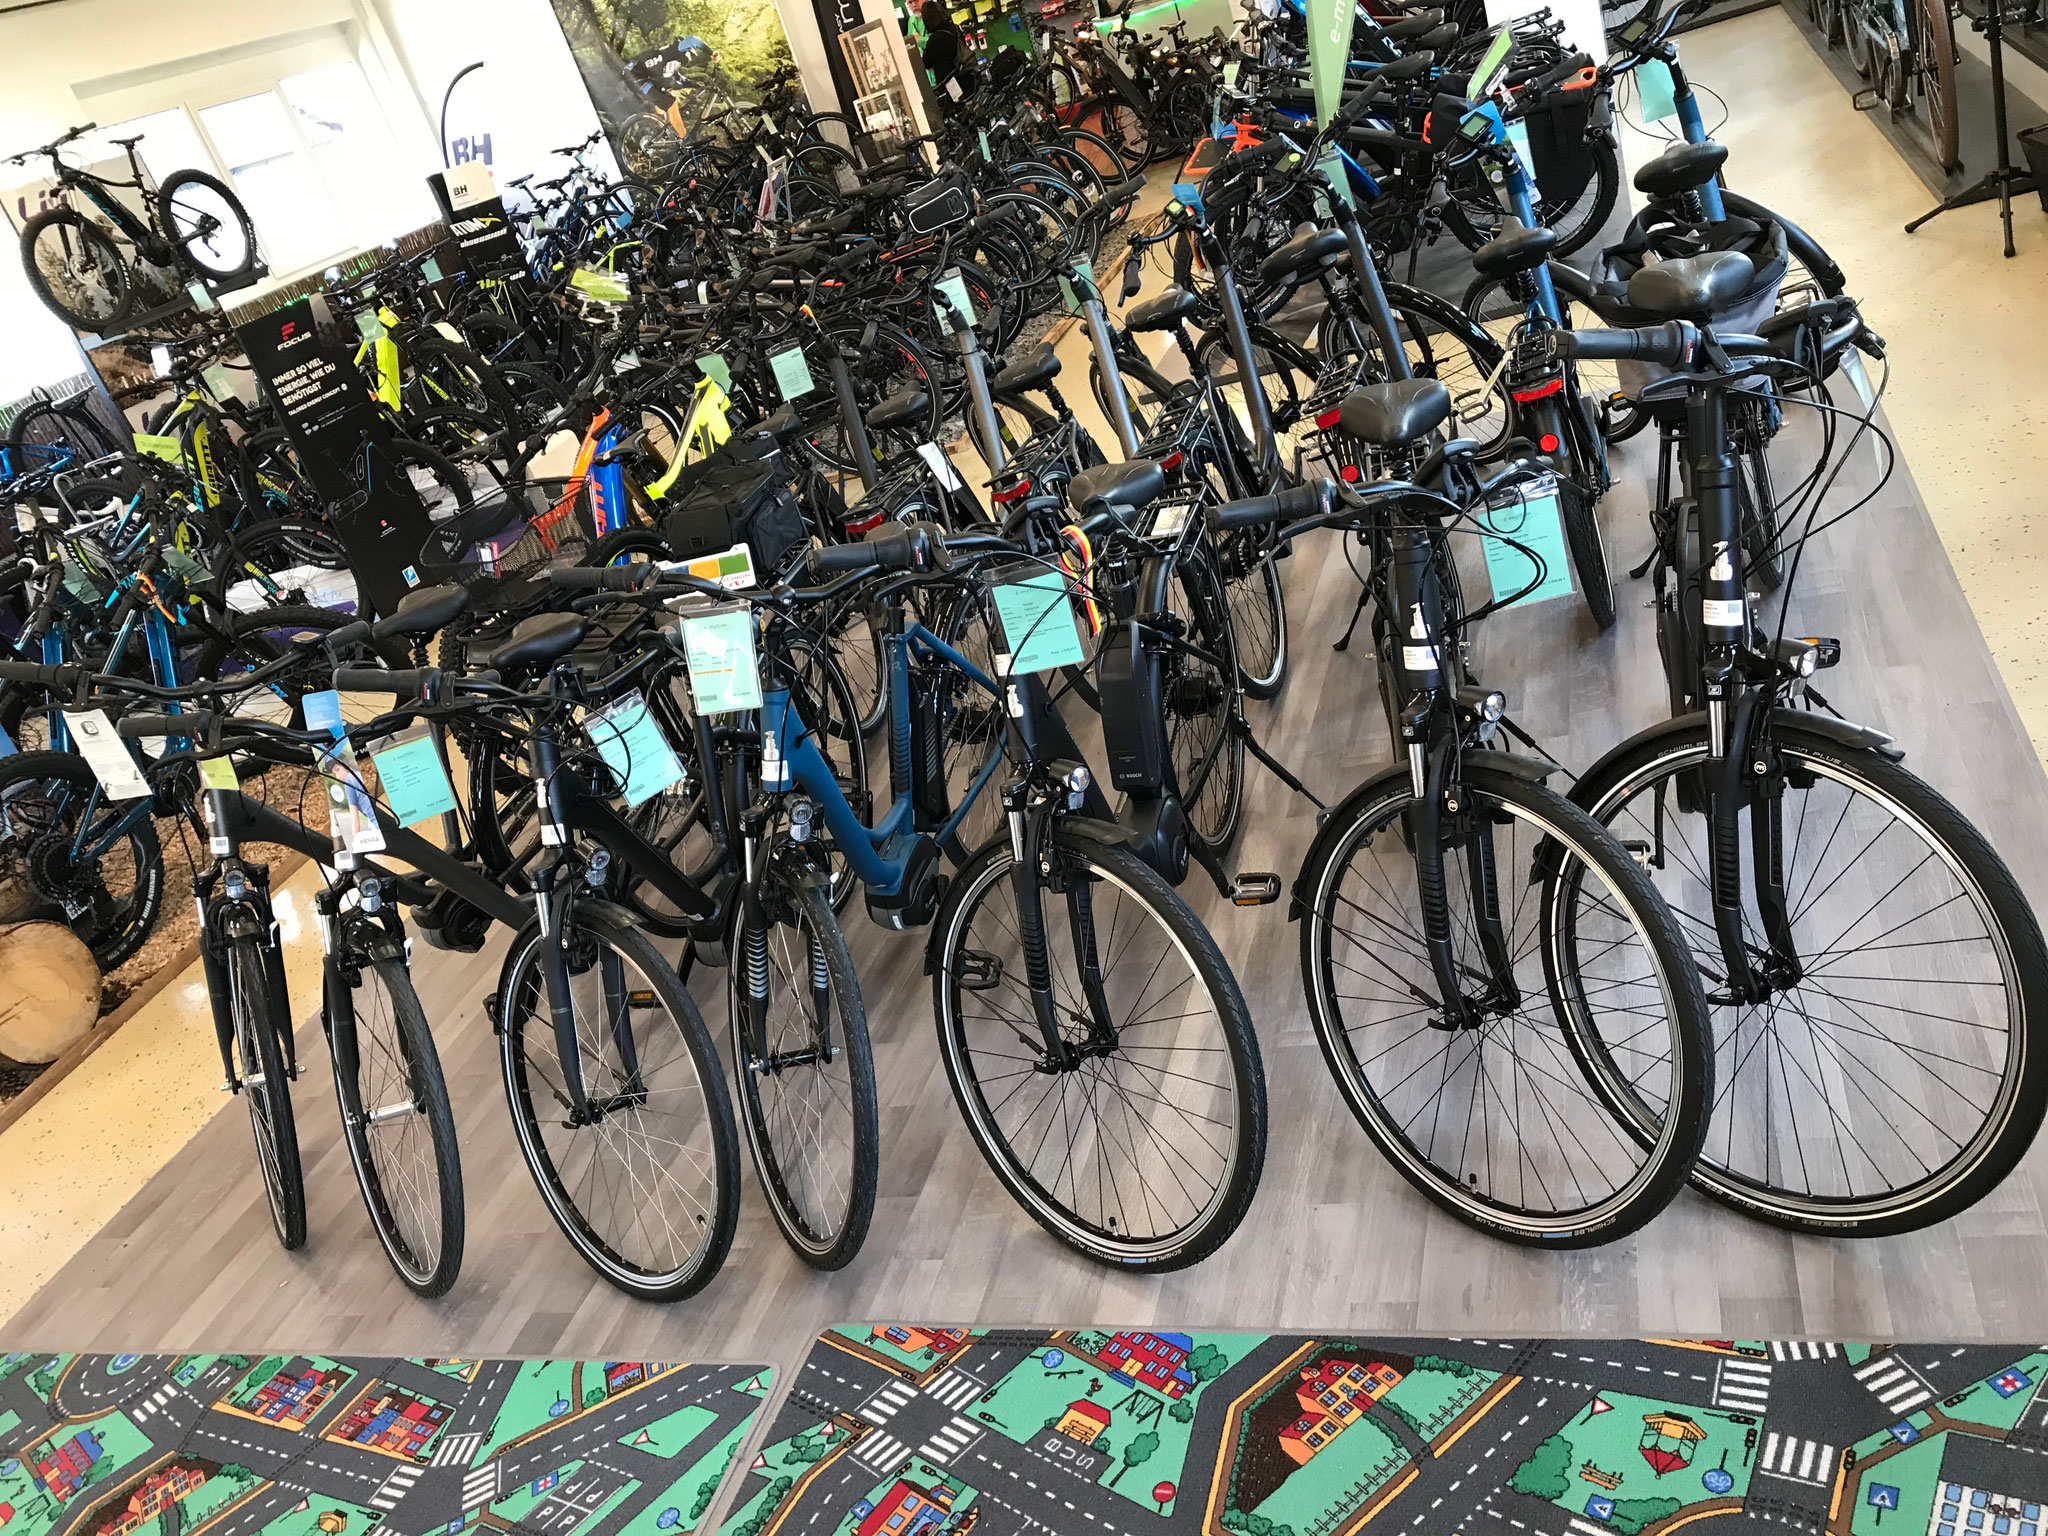 Unsere City e-Bike Welt